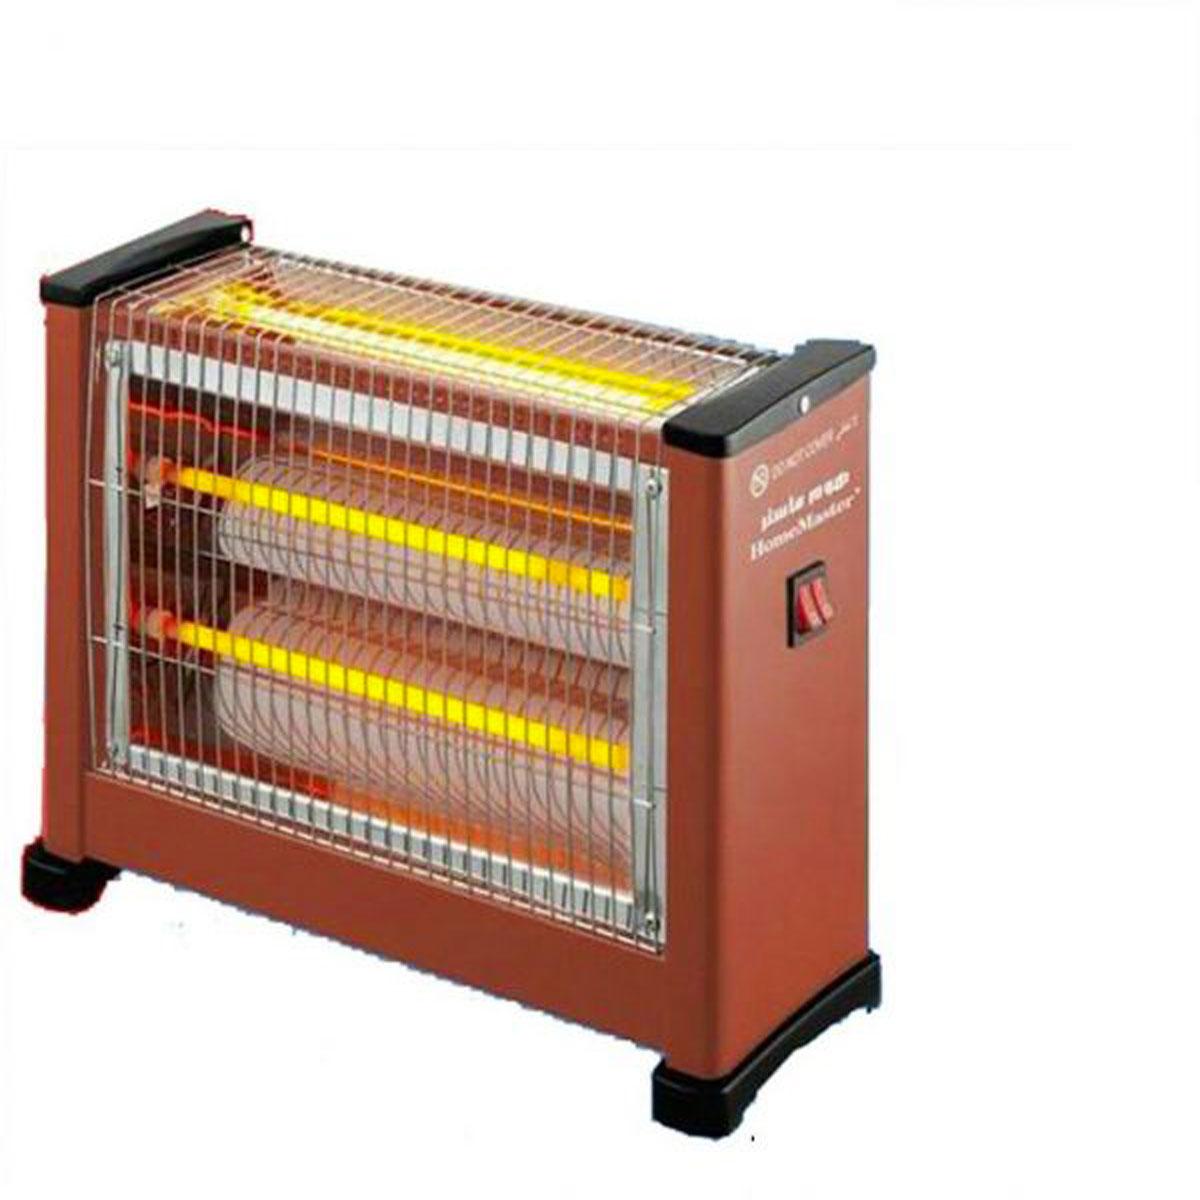 دفاية كهربائية هوم ماستر  , 1800 واط , موديل HM-601